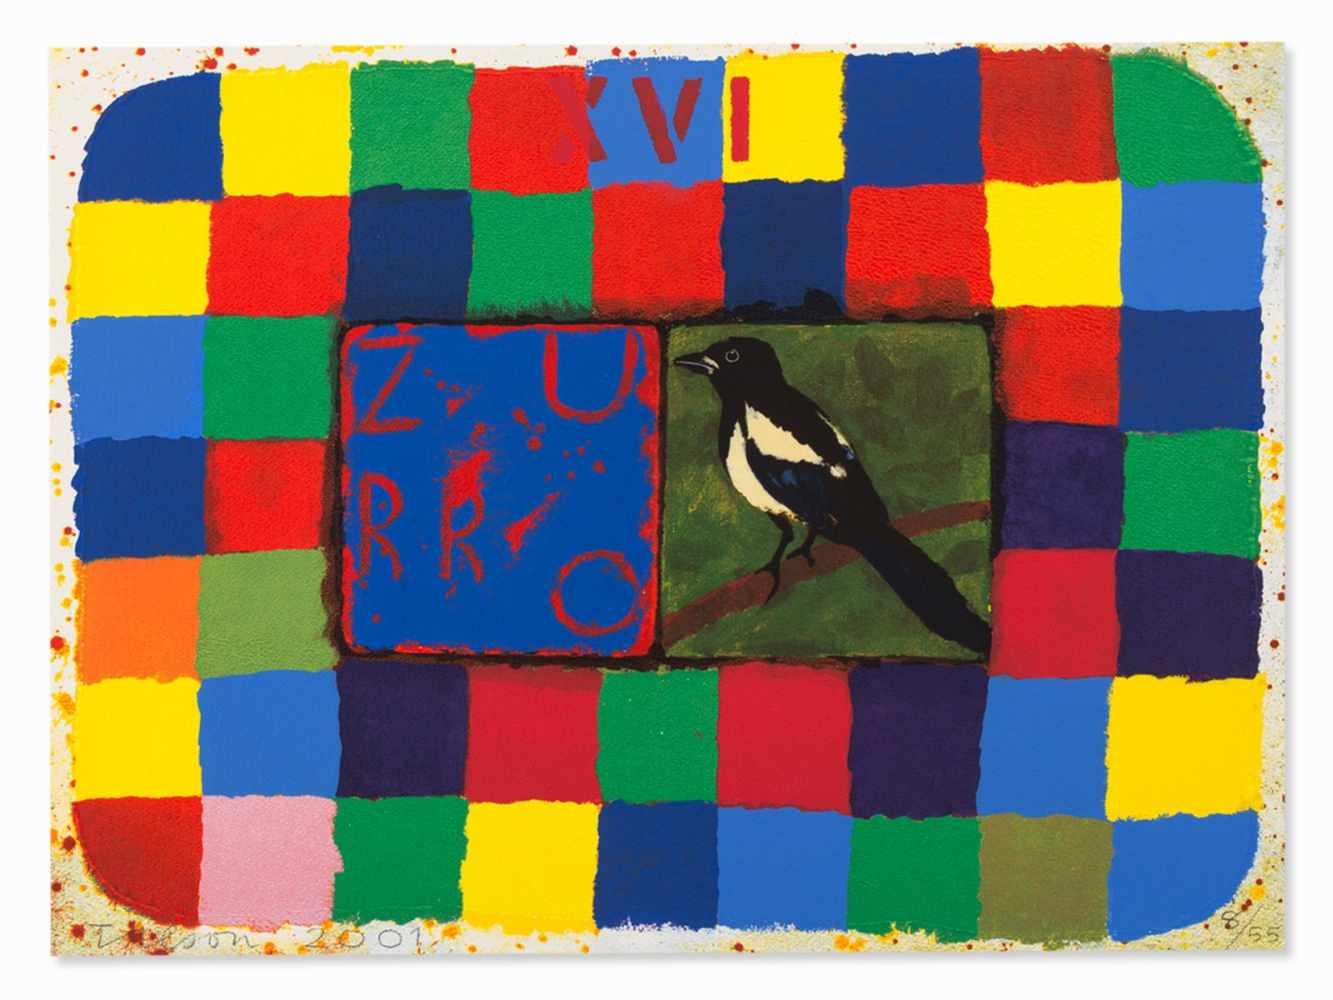 Joe Tilson, Conjunctions, 3 Serigraphs in Colors, 2001 - Image 2 of 7